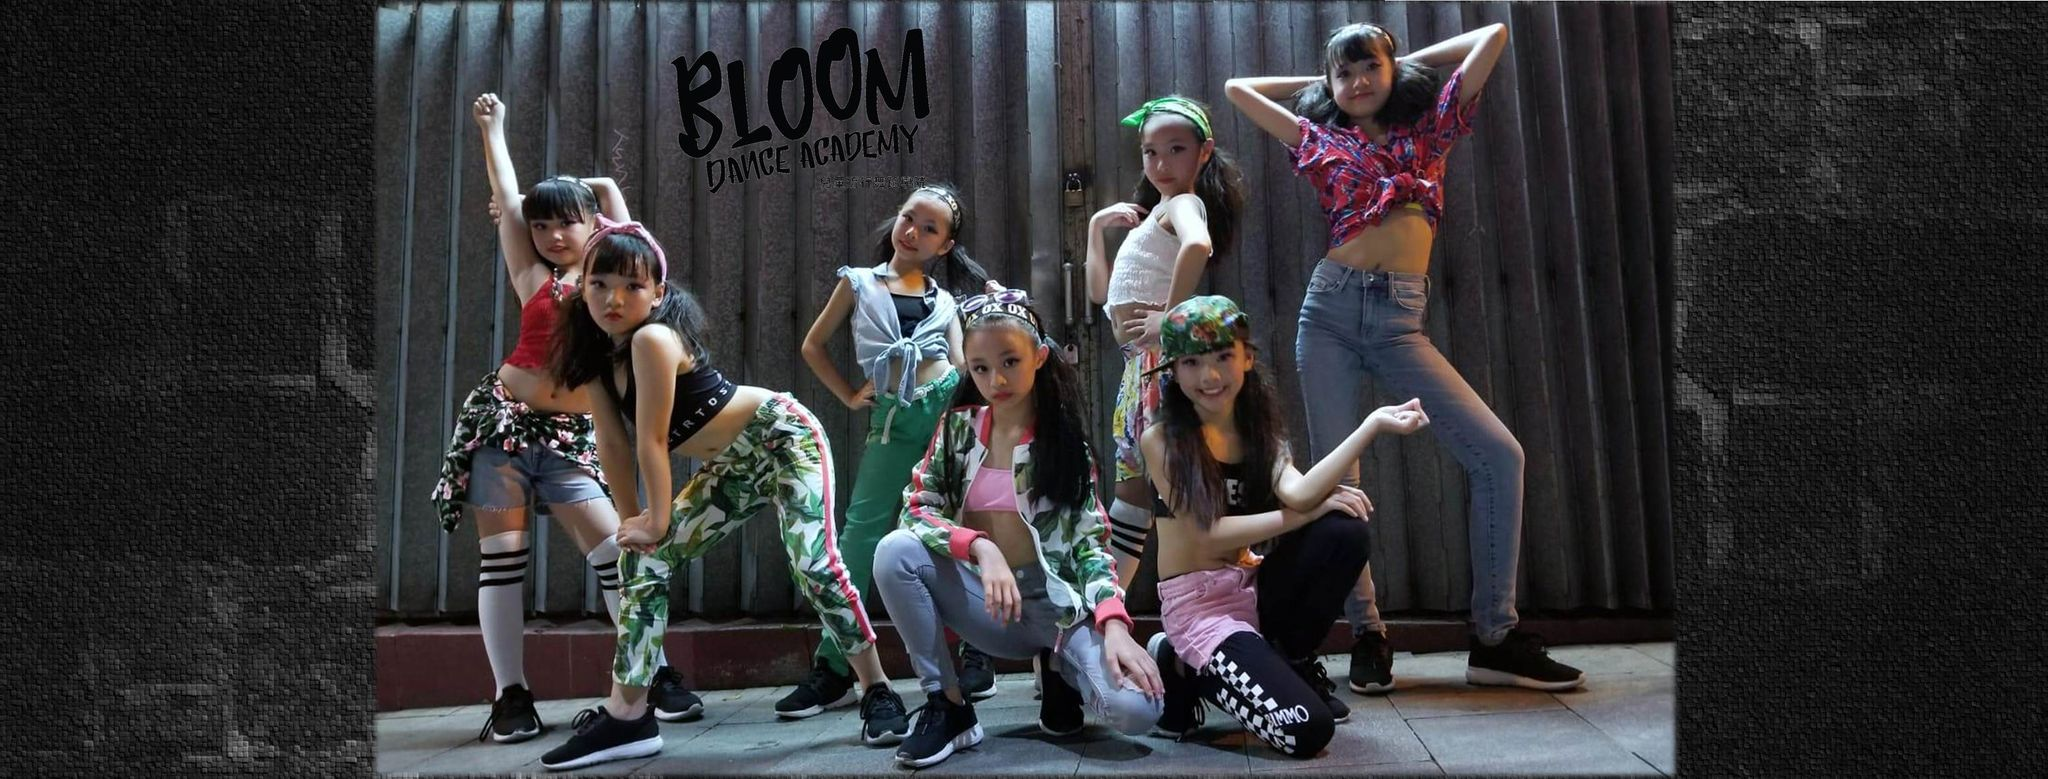 Bloom Dance Academy